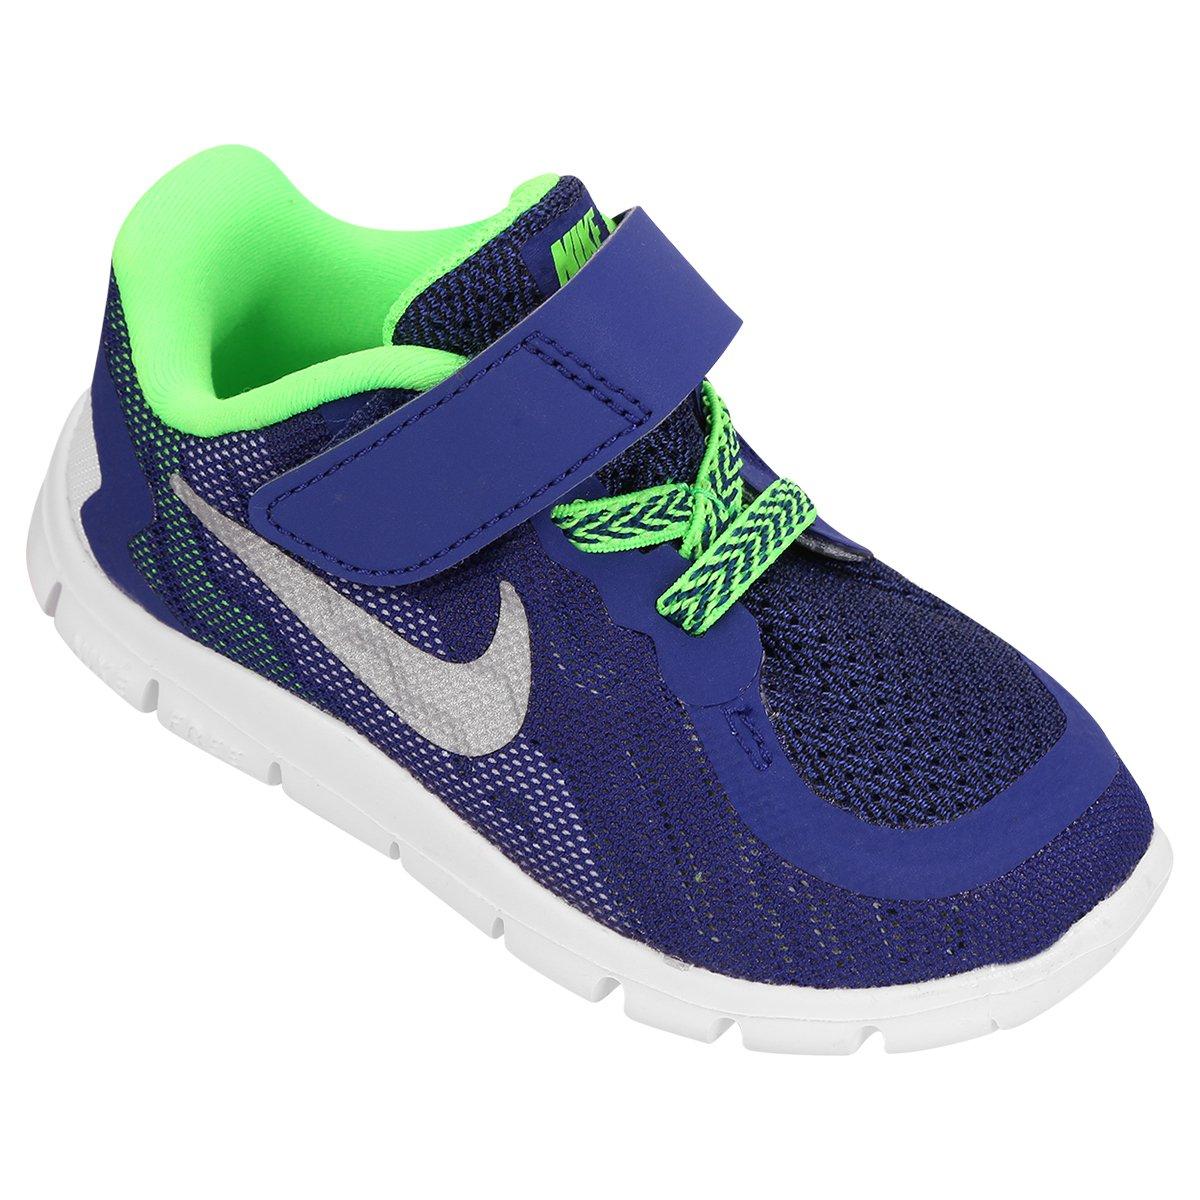 36aa236bd77 Tênis Nike Free 5.0 Baby - Compre Agora